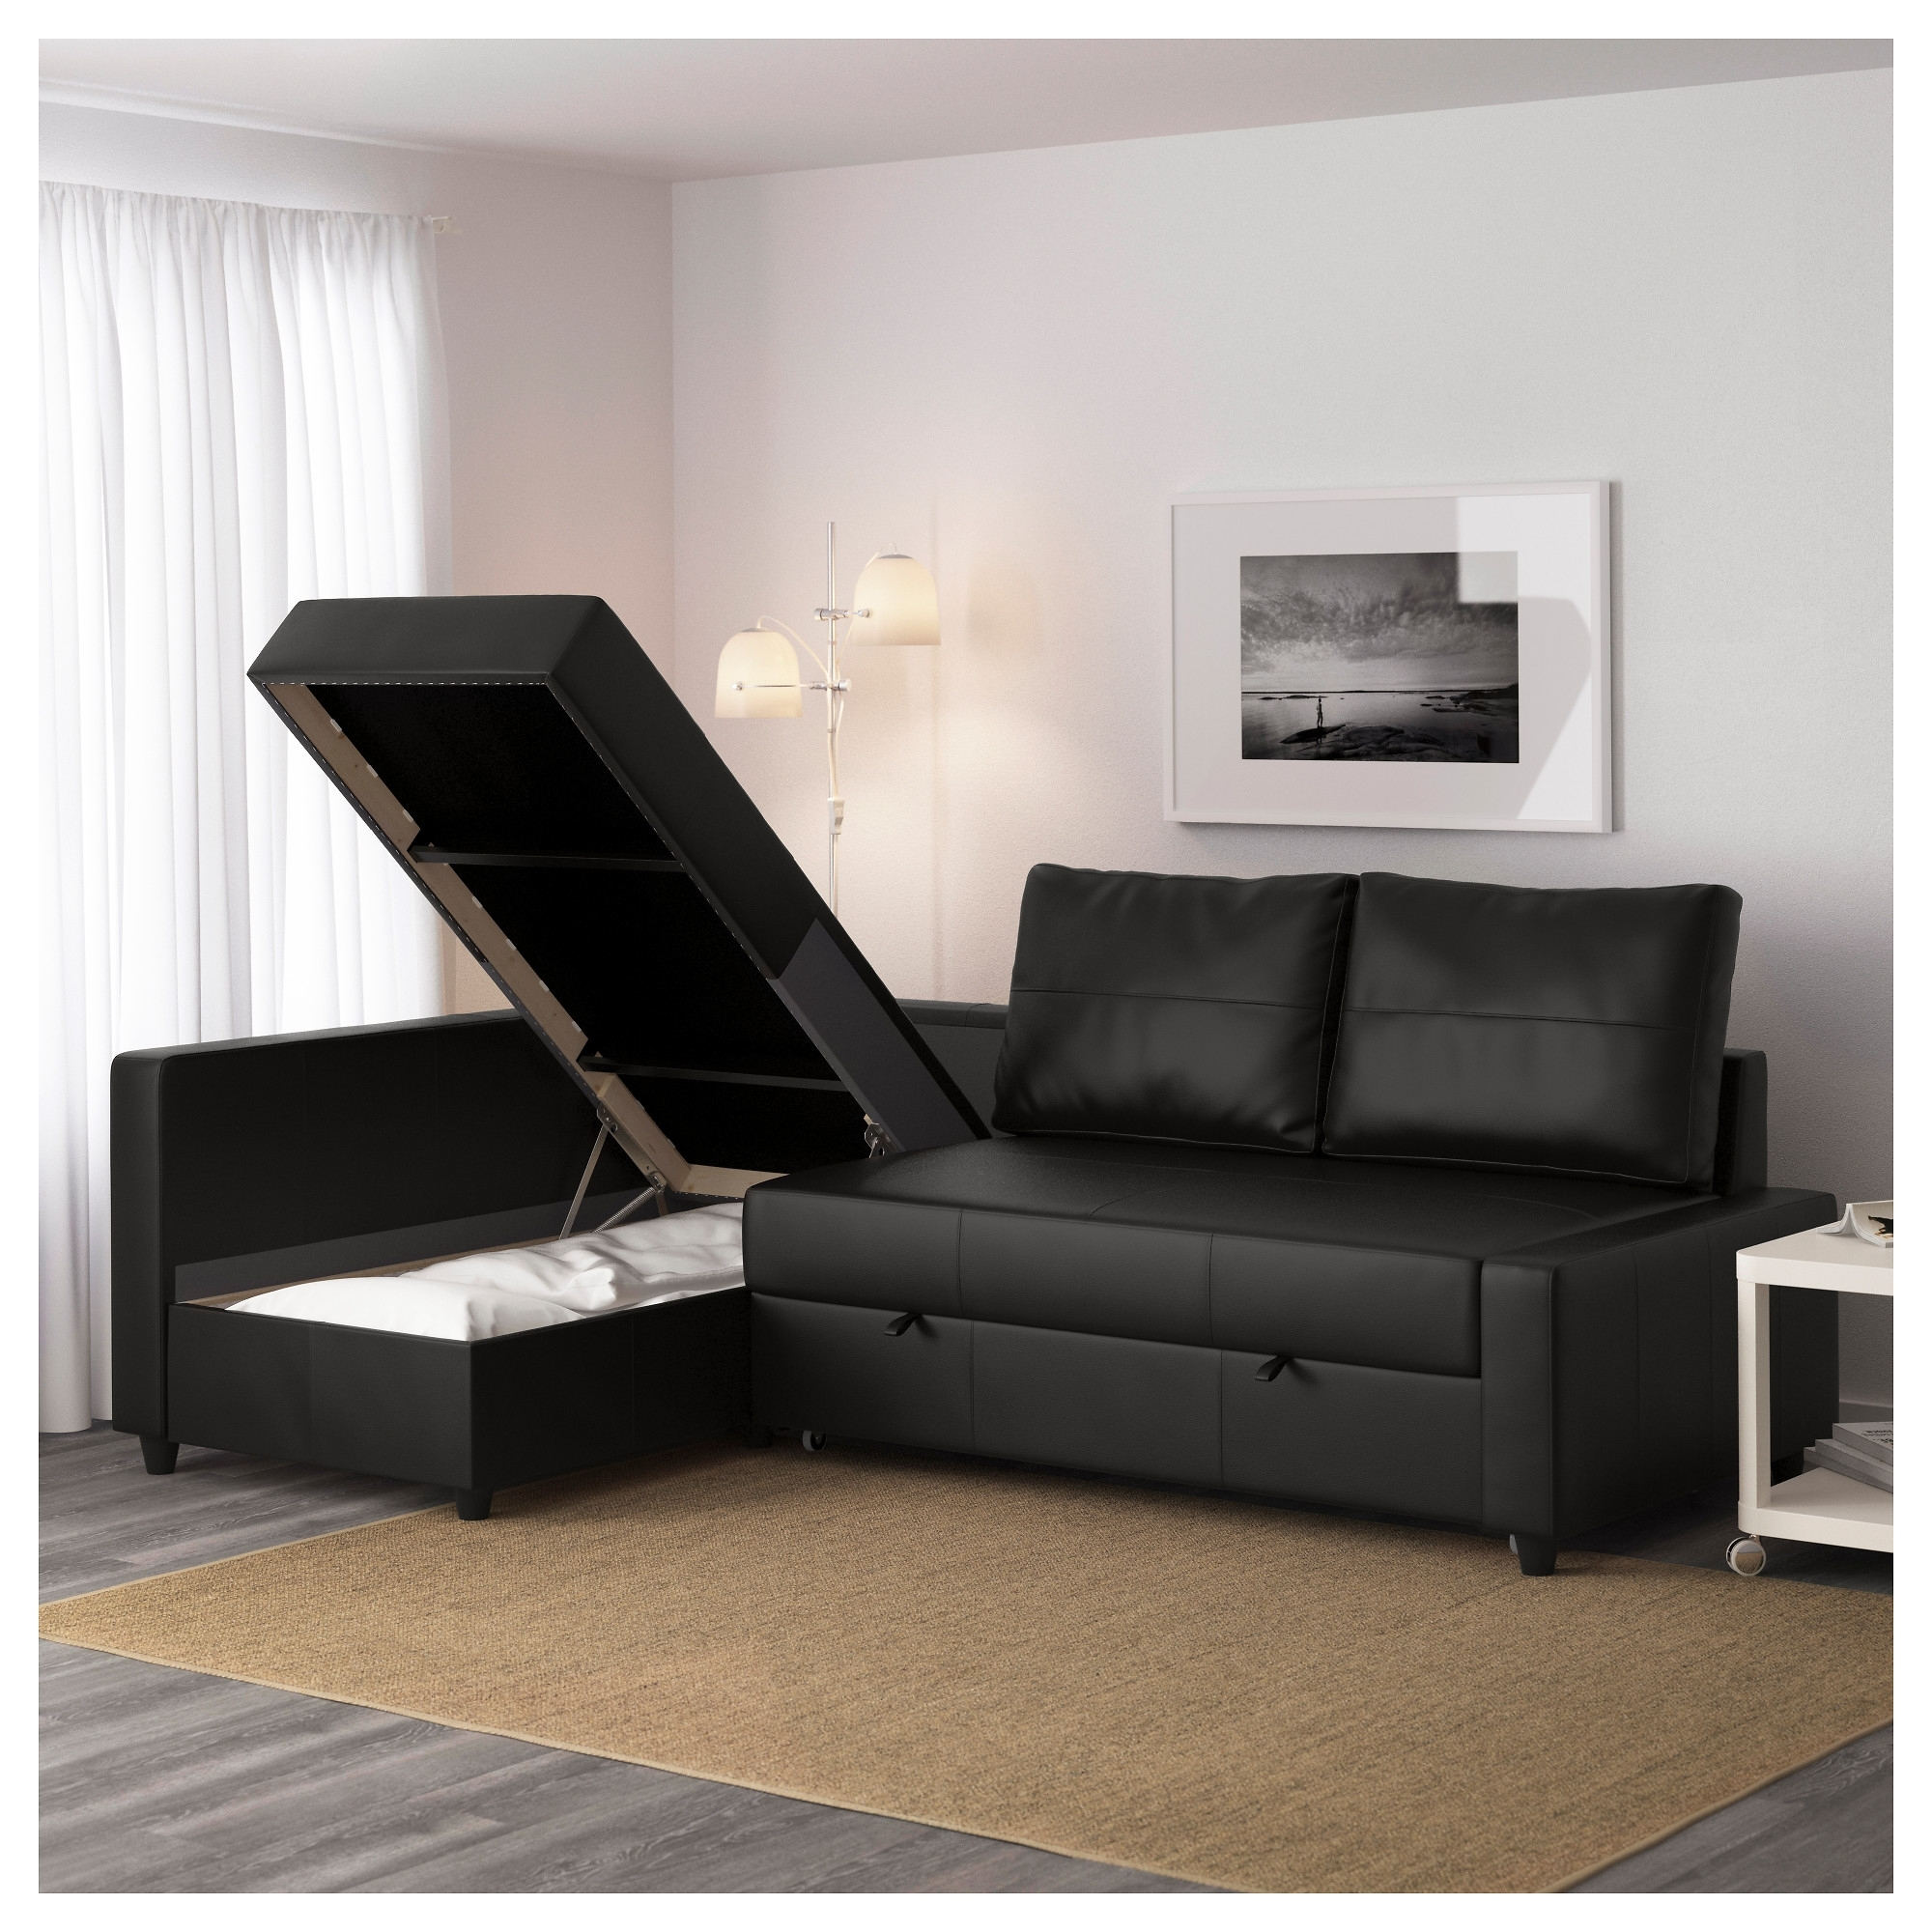 Friheten Sleeper Sectional,3 Seat W/storage – Skiftebo Dark Gray – Ikea Throughout Sectional Sofas With Storage (View 6 of 10)